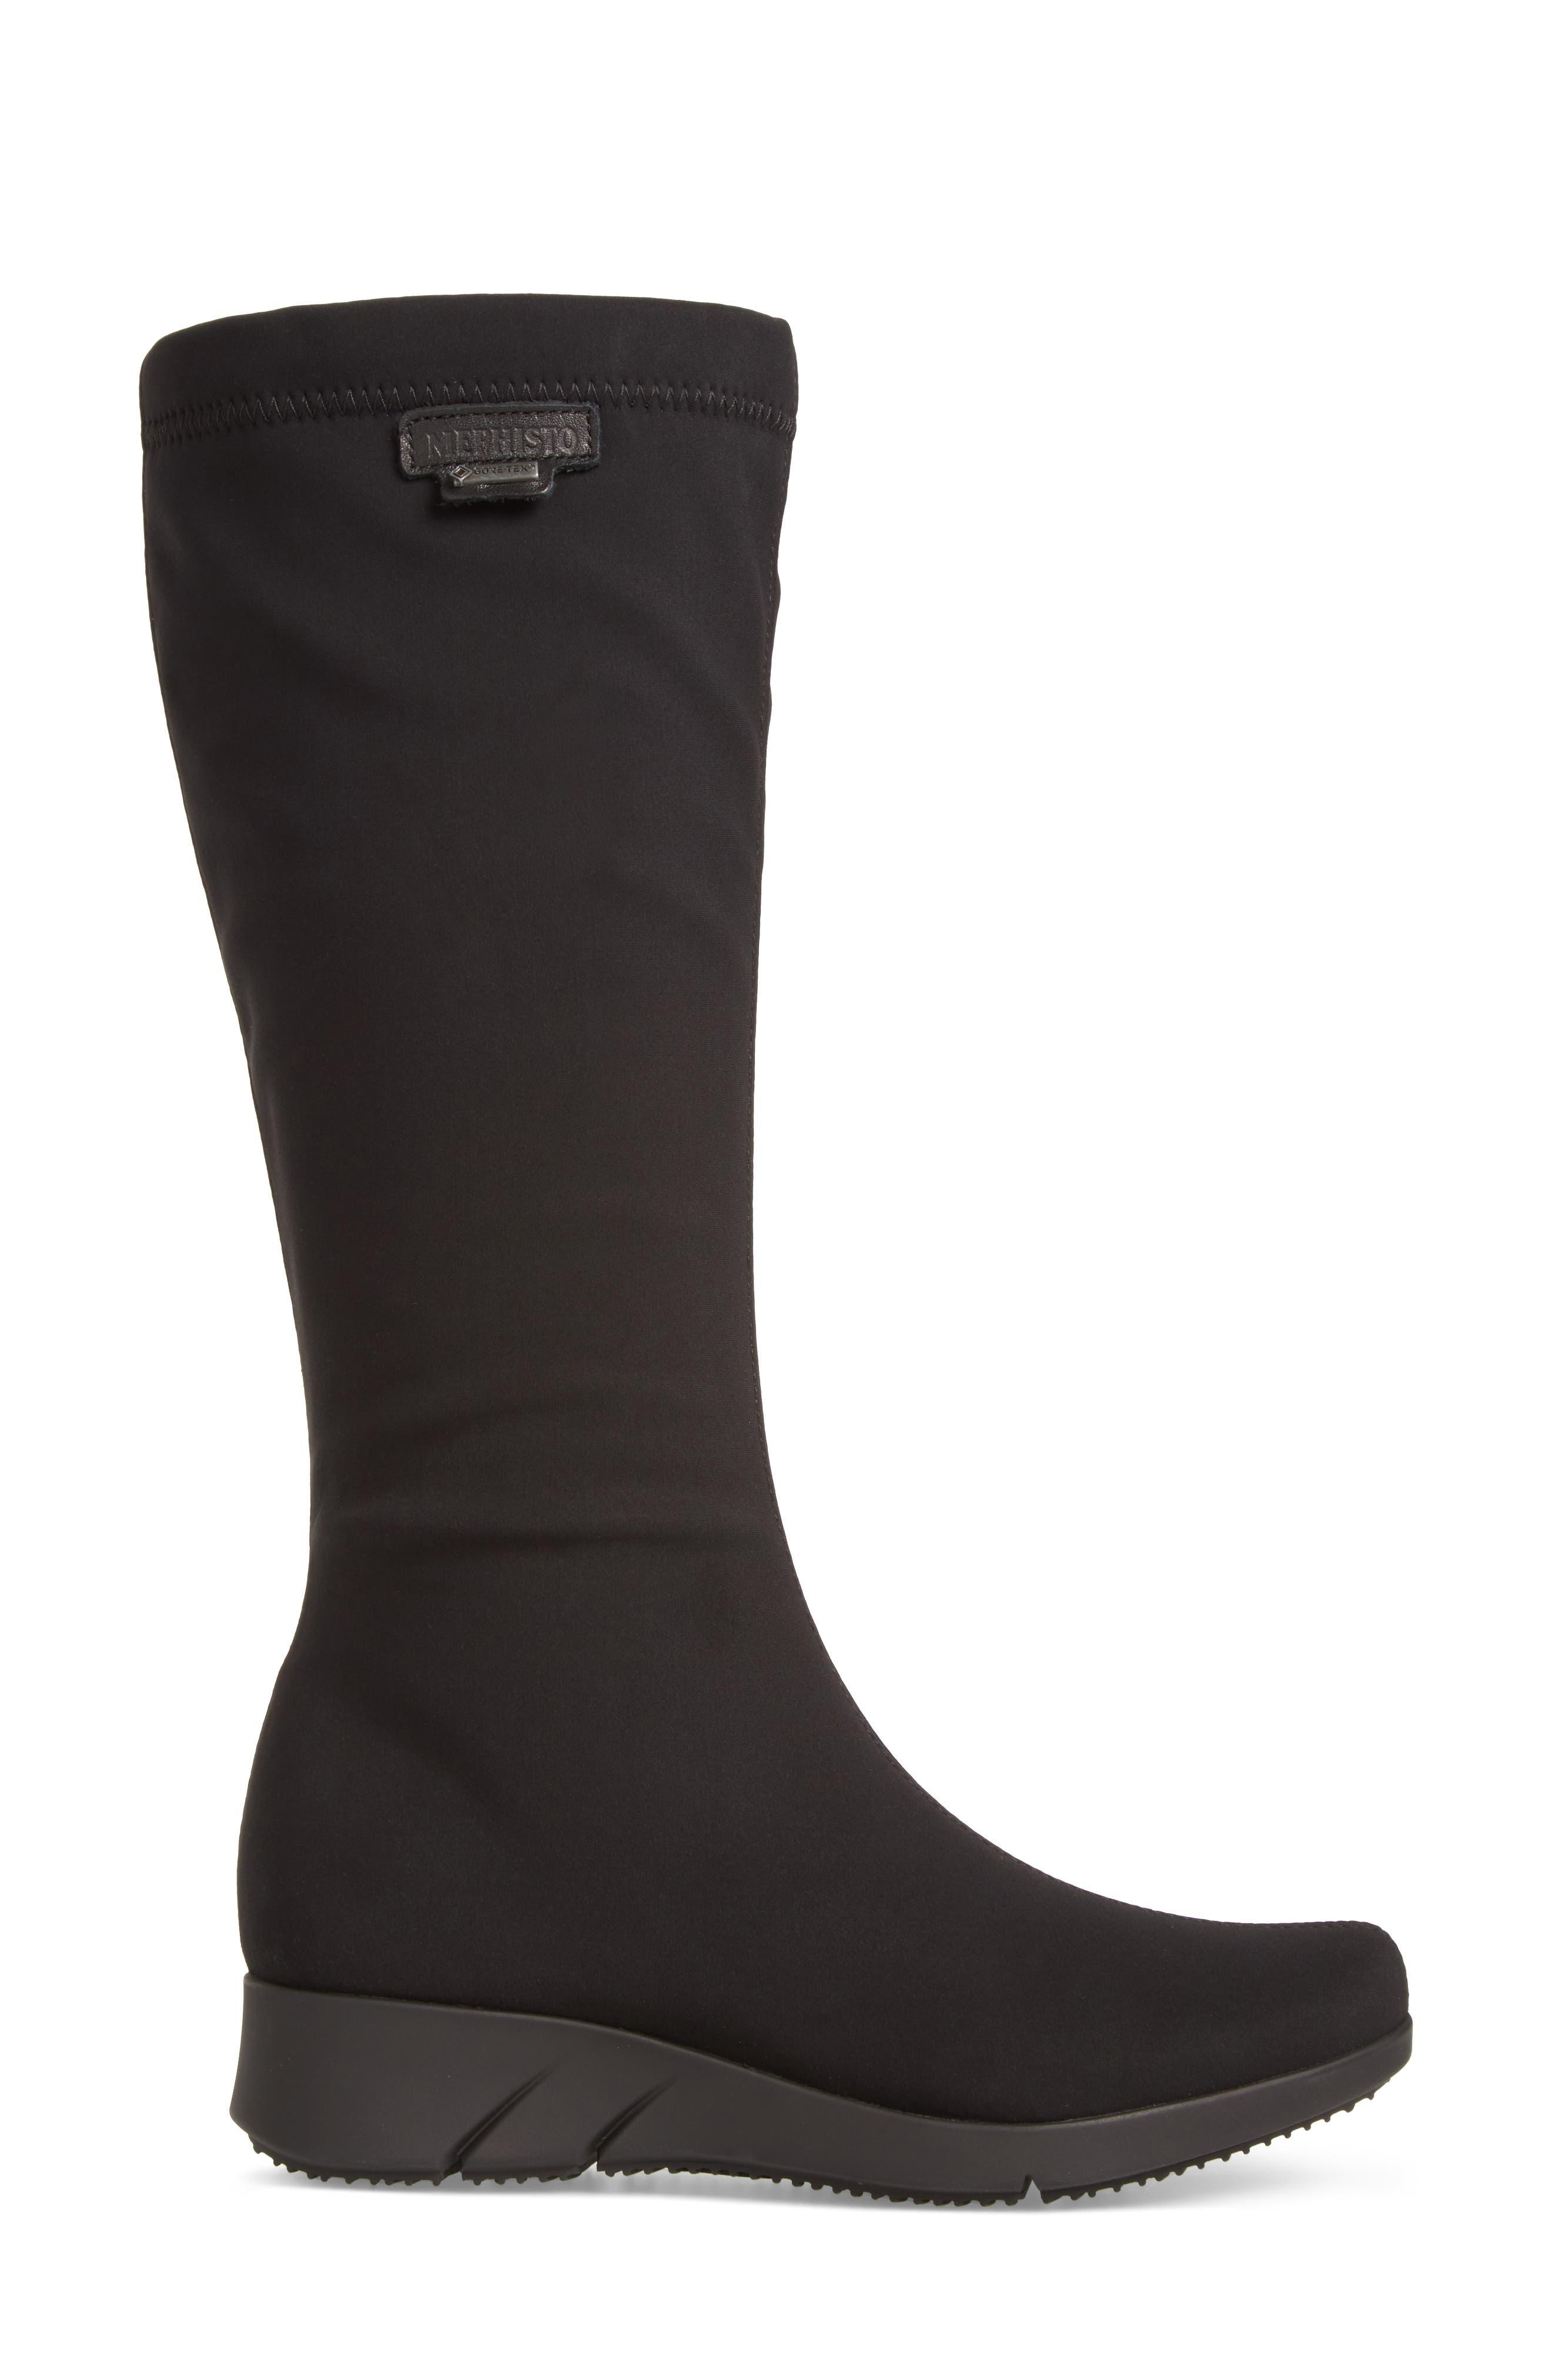 Minda Waterproof Wedge Boot,                             Alternate thumbnail 3, color,                             009